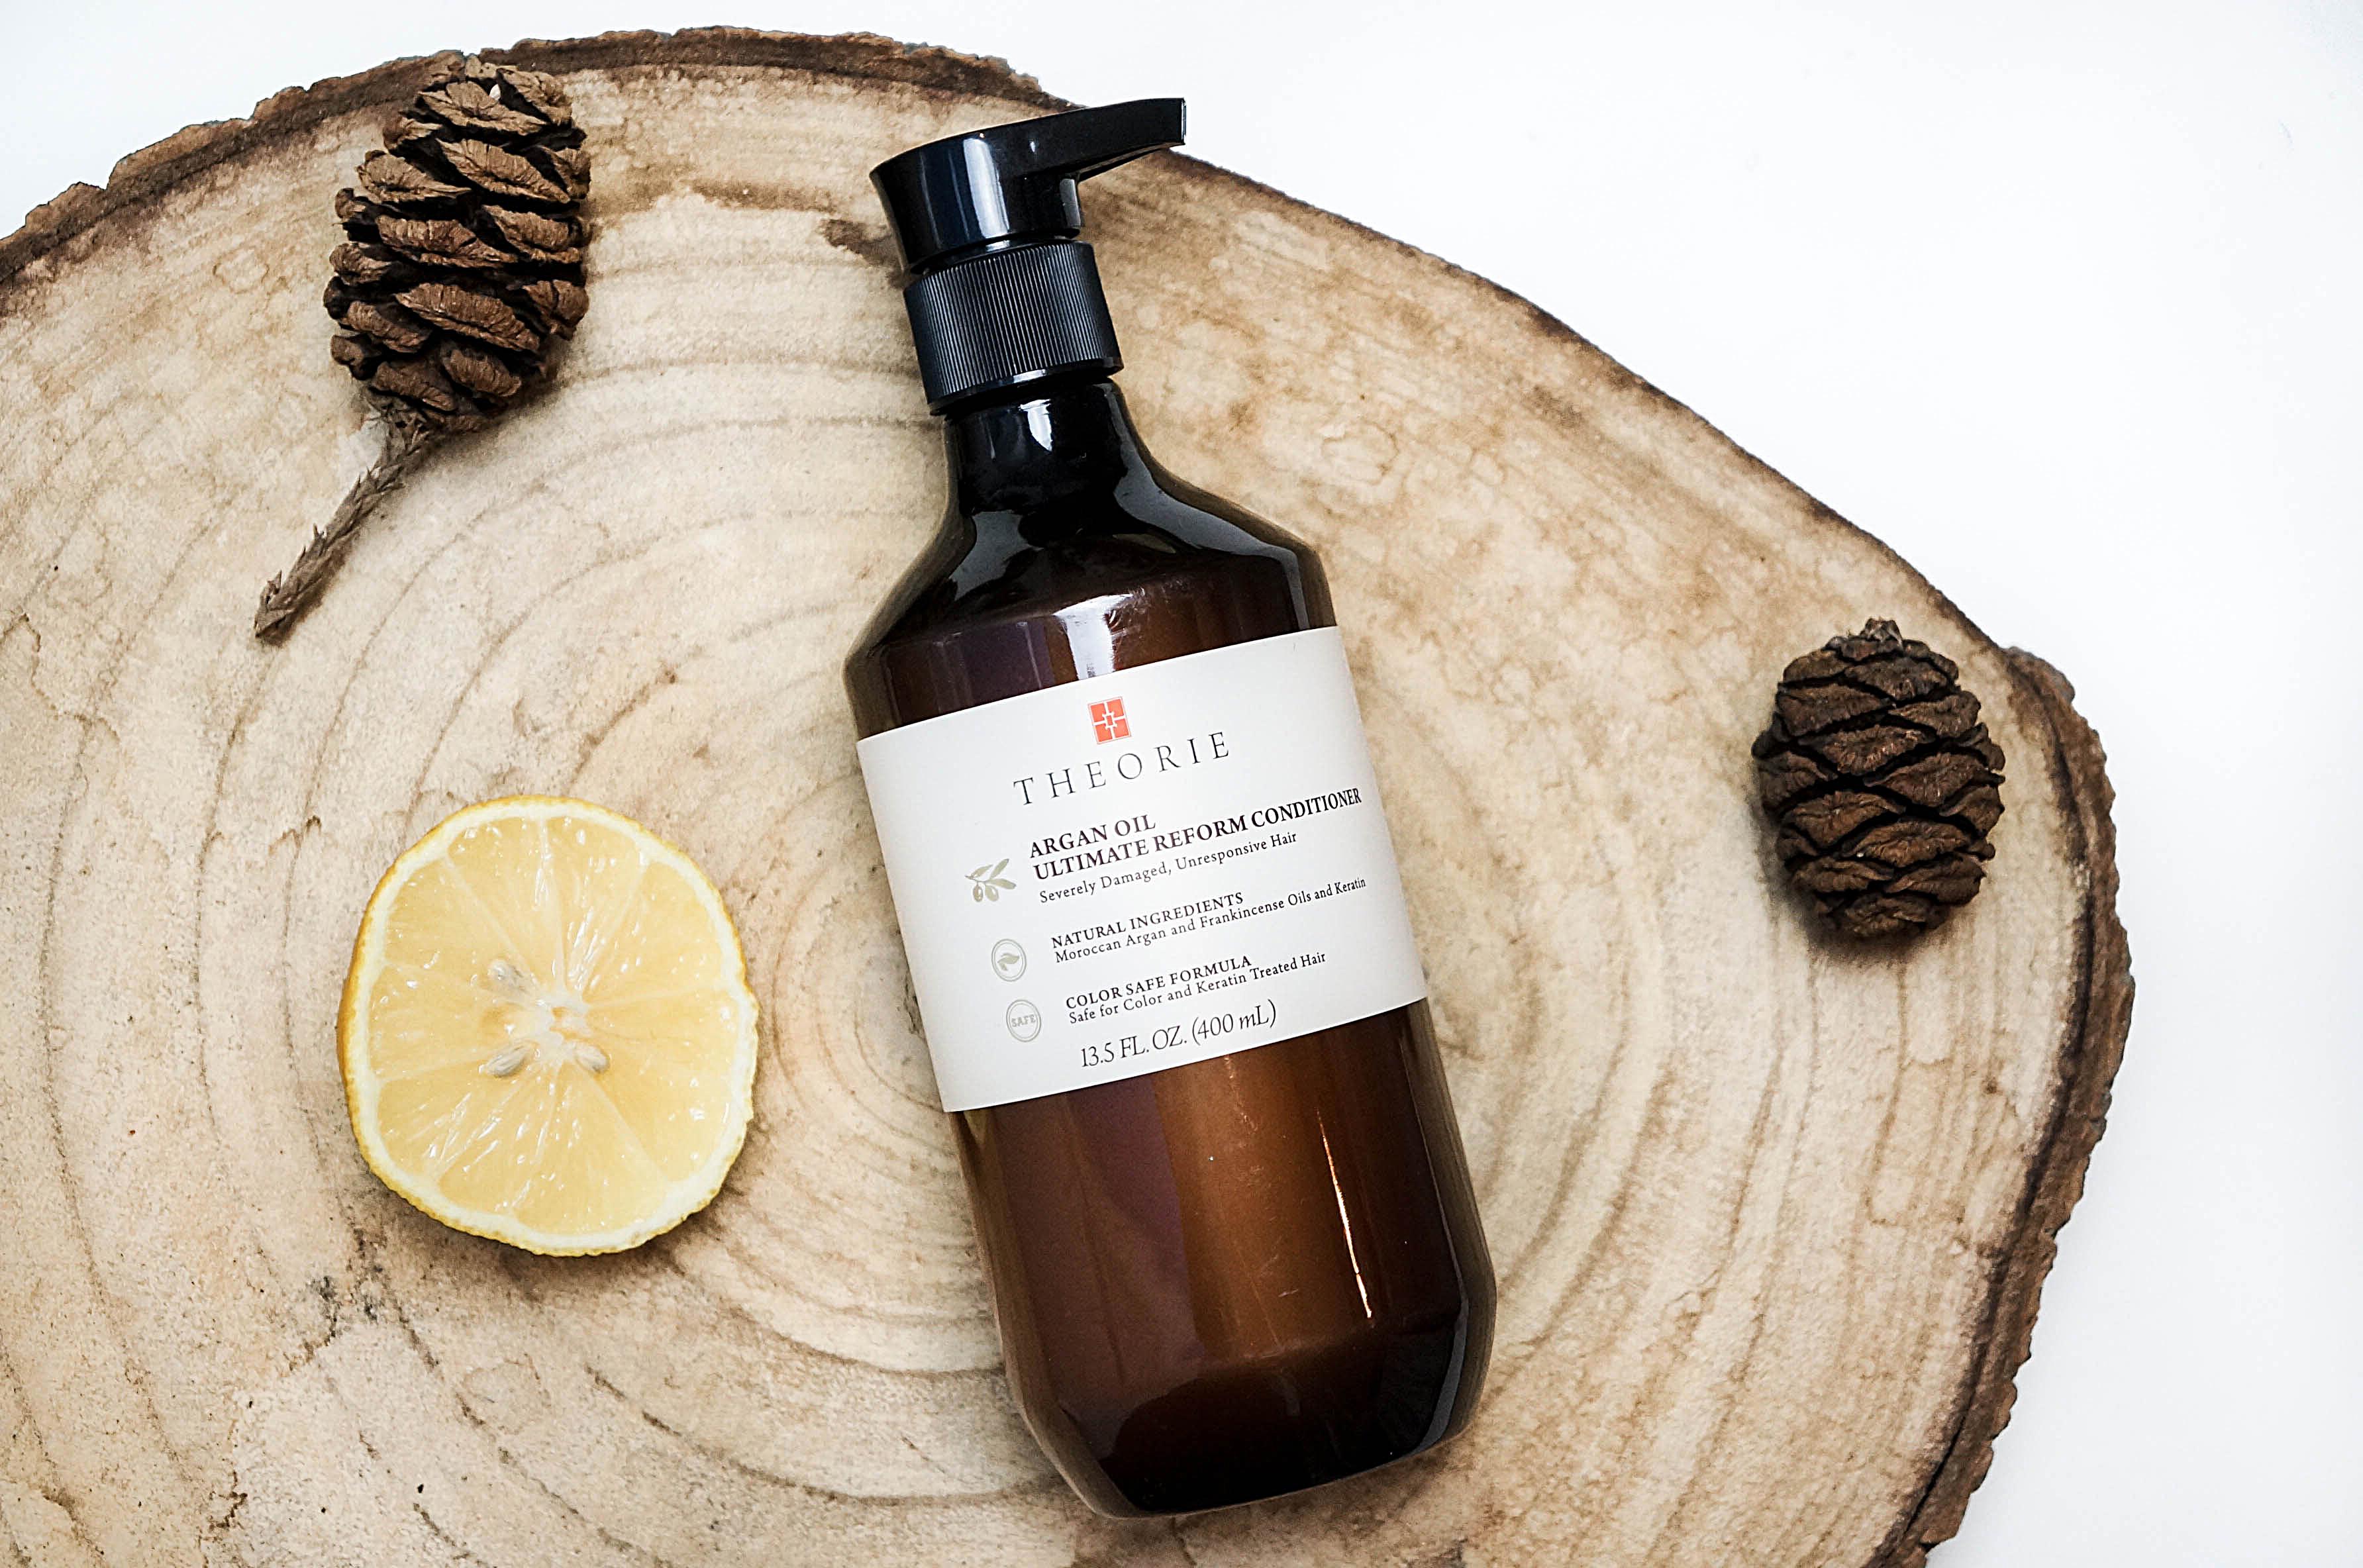 Theorie Conditioner Naturkosmetik Shampoo Organic Vegan